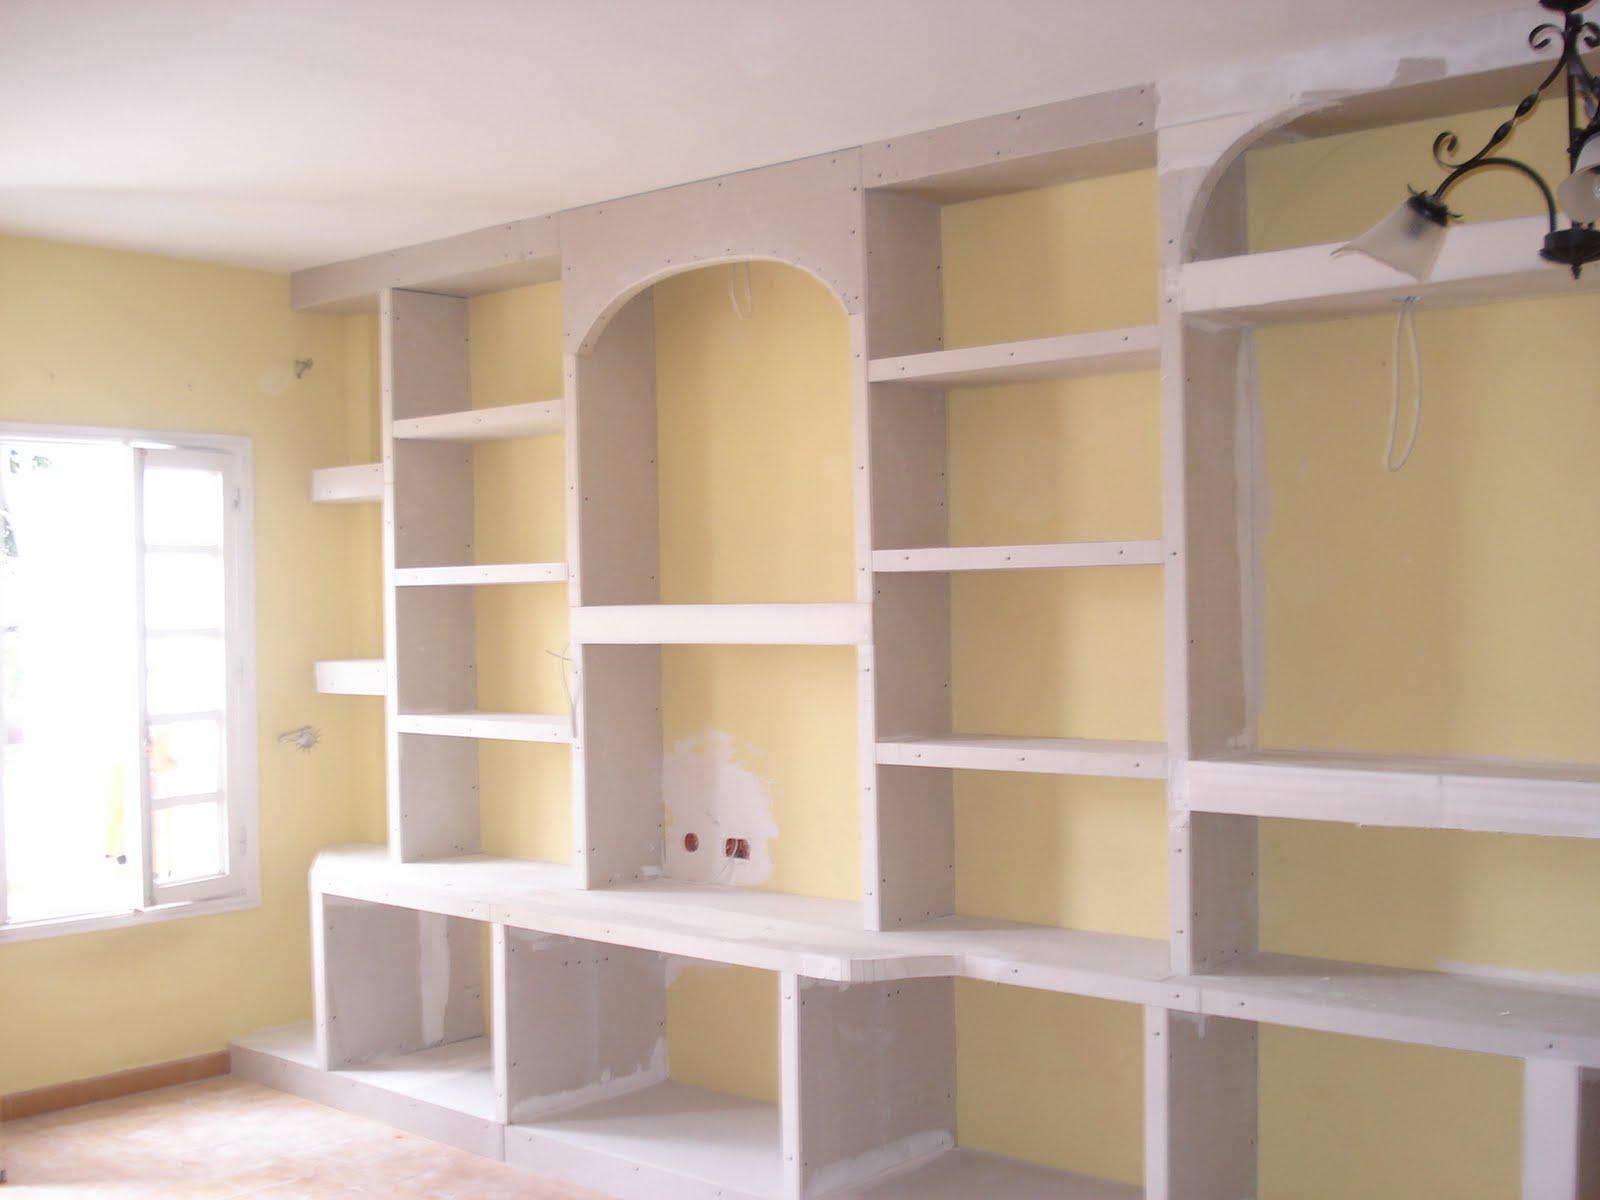 Pladur en tenerife instaladores mueble de pladur for Muebles pladur